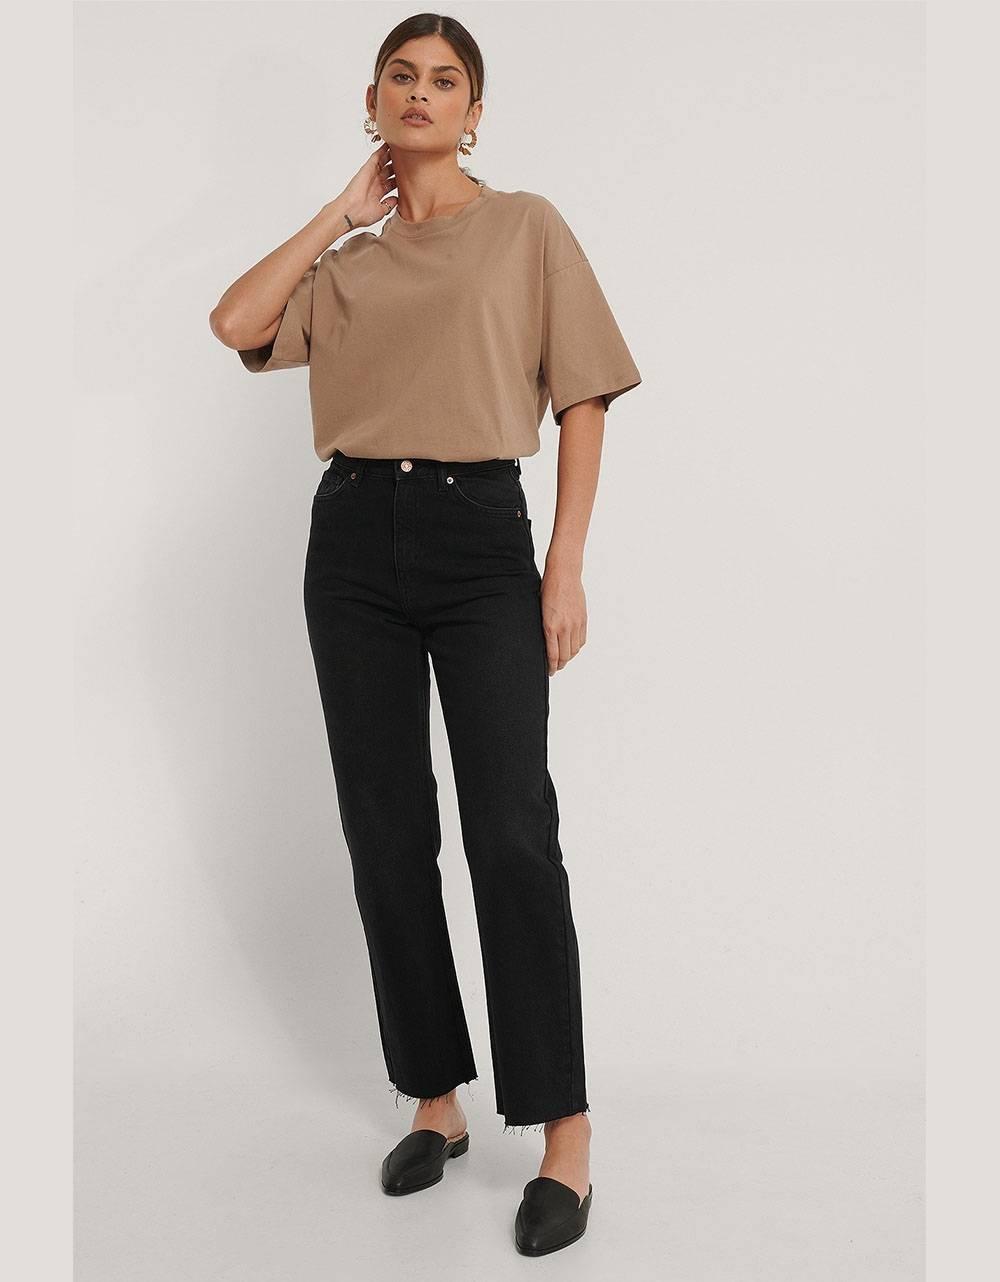 NA-KD organic straight high waist raw hem jeans - washed black NA-KD Jeans 69,00€